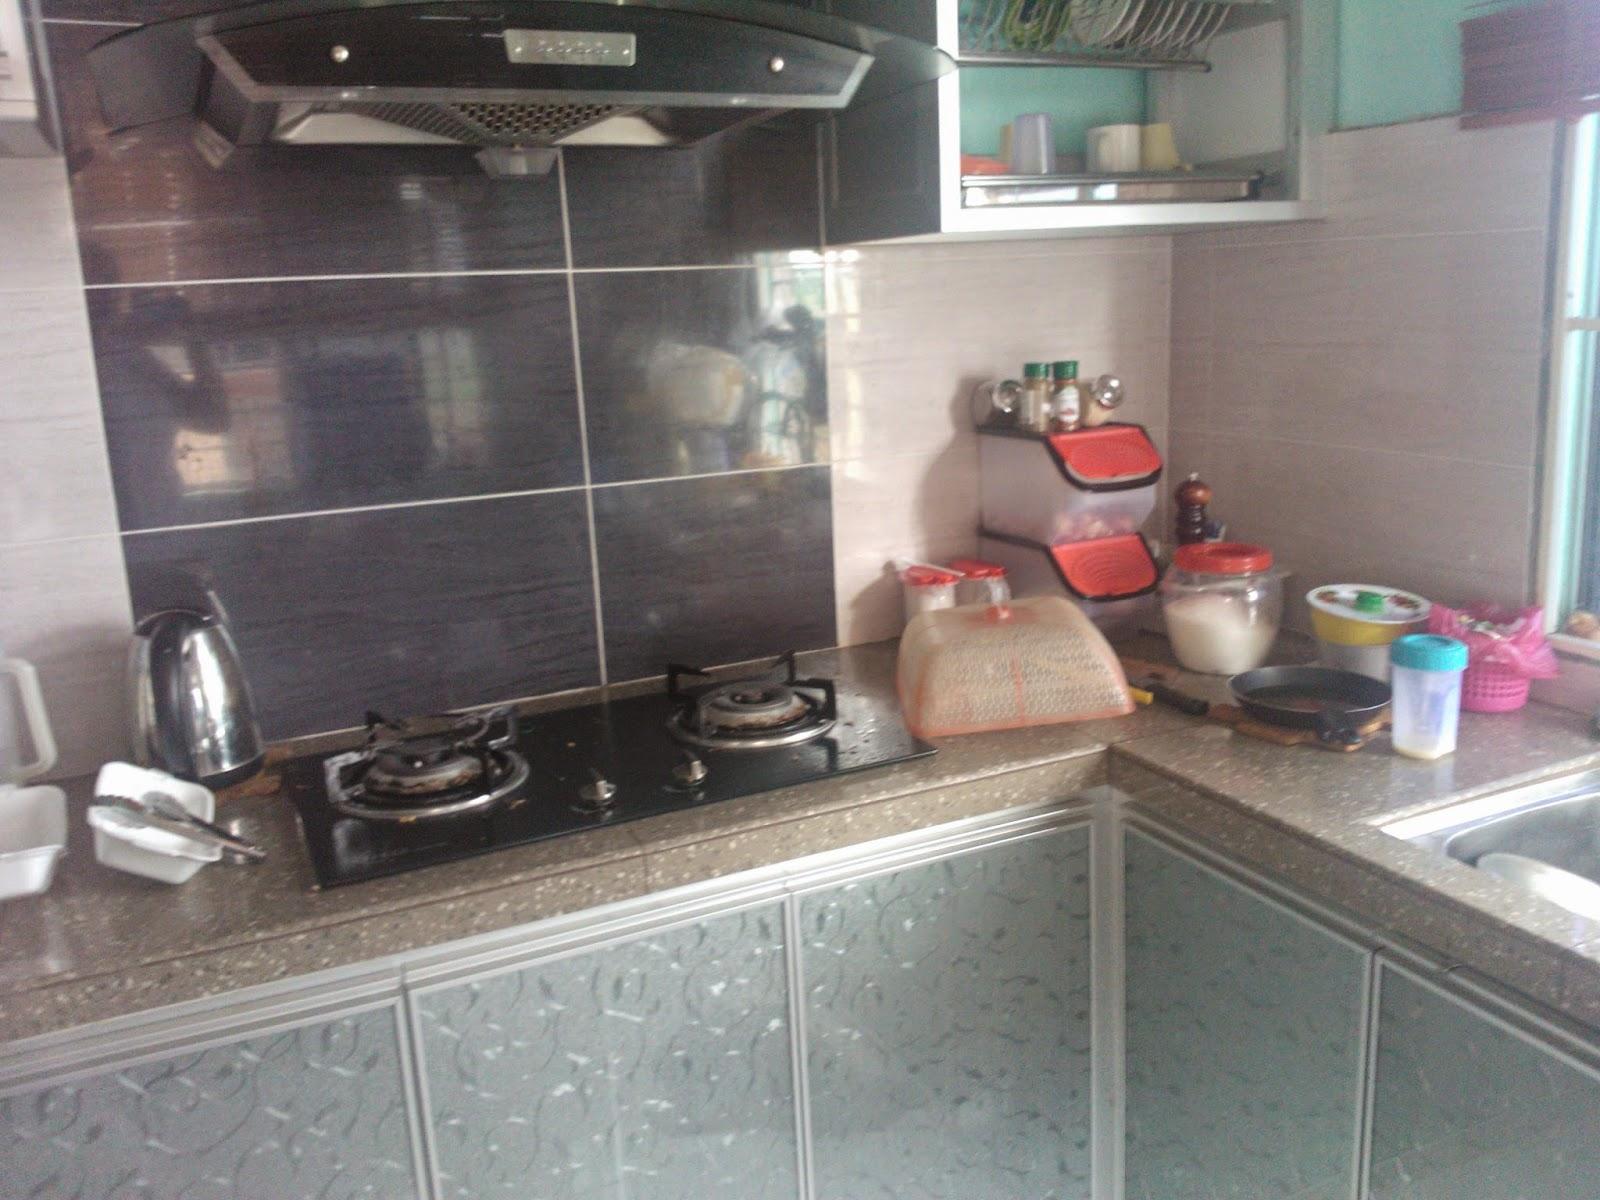 Agak Korang Berapa Lama Aku Tak Cuci Dapur Tu Malaskan Ni